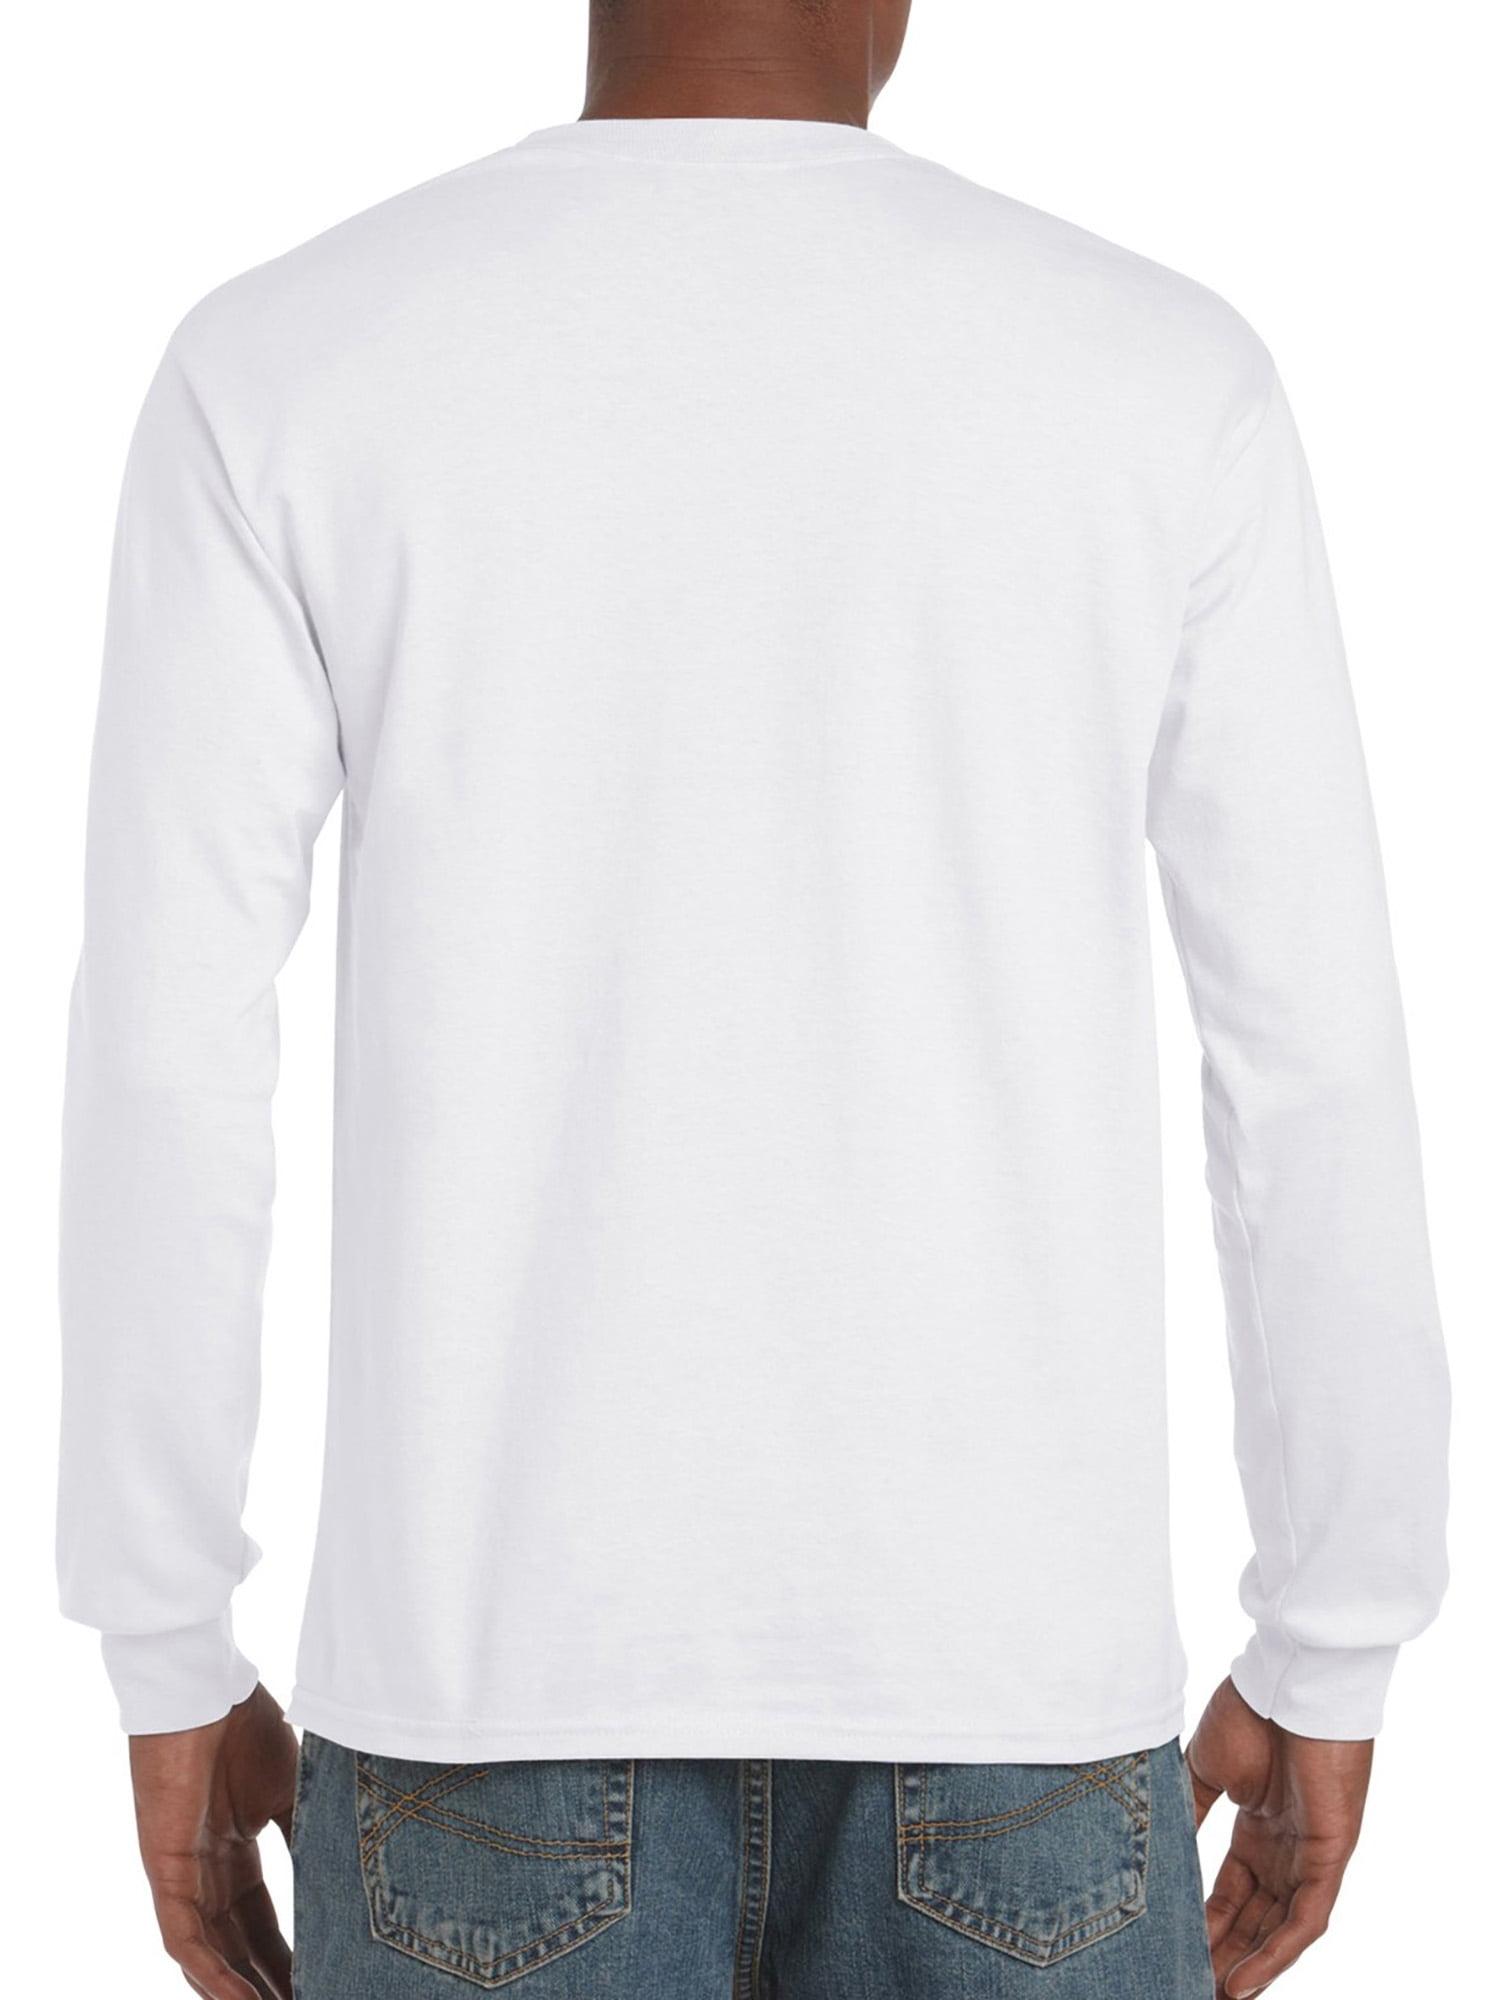 Mens Ultra Cotton Adult Long Sleeve T-Shirt